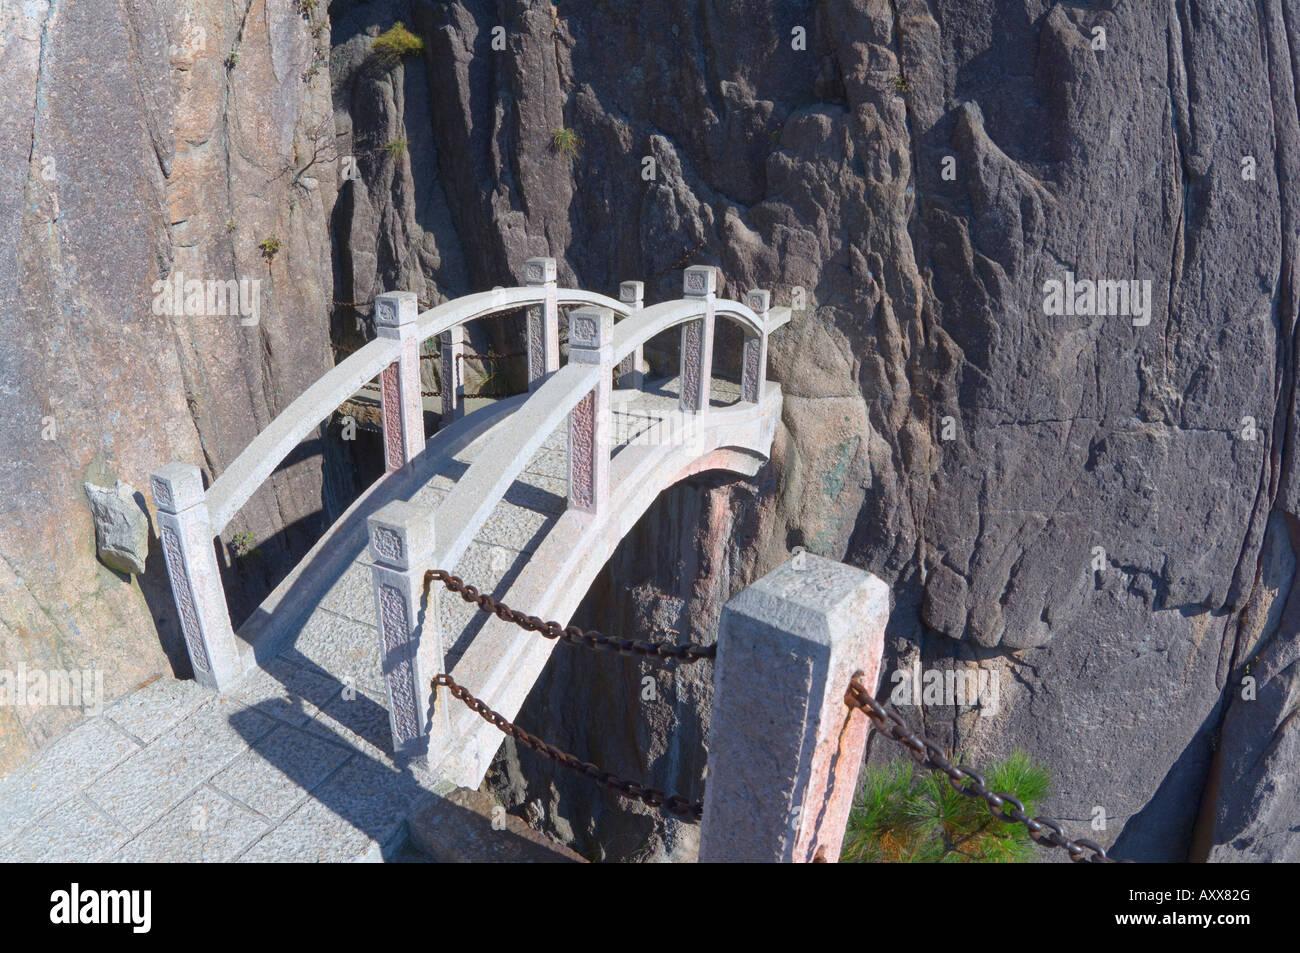 Footbridge, White Cloud scenic area, Huang Shan (Yellow Mountain), UNESCO World Heritage Site, Anhui Province, China, Stock Photo